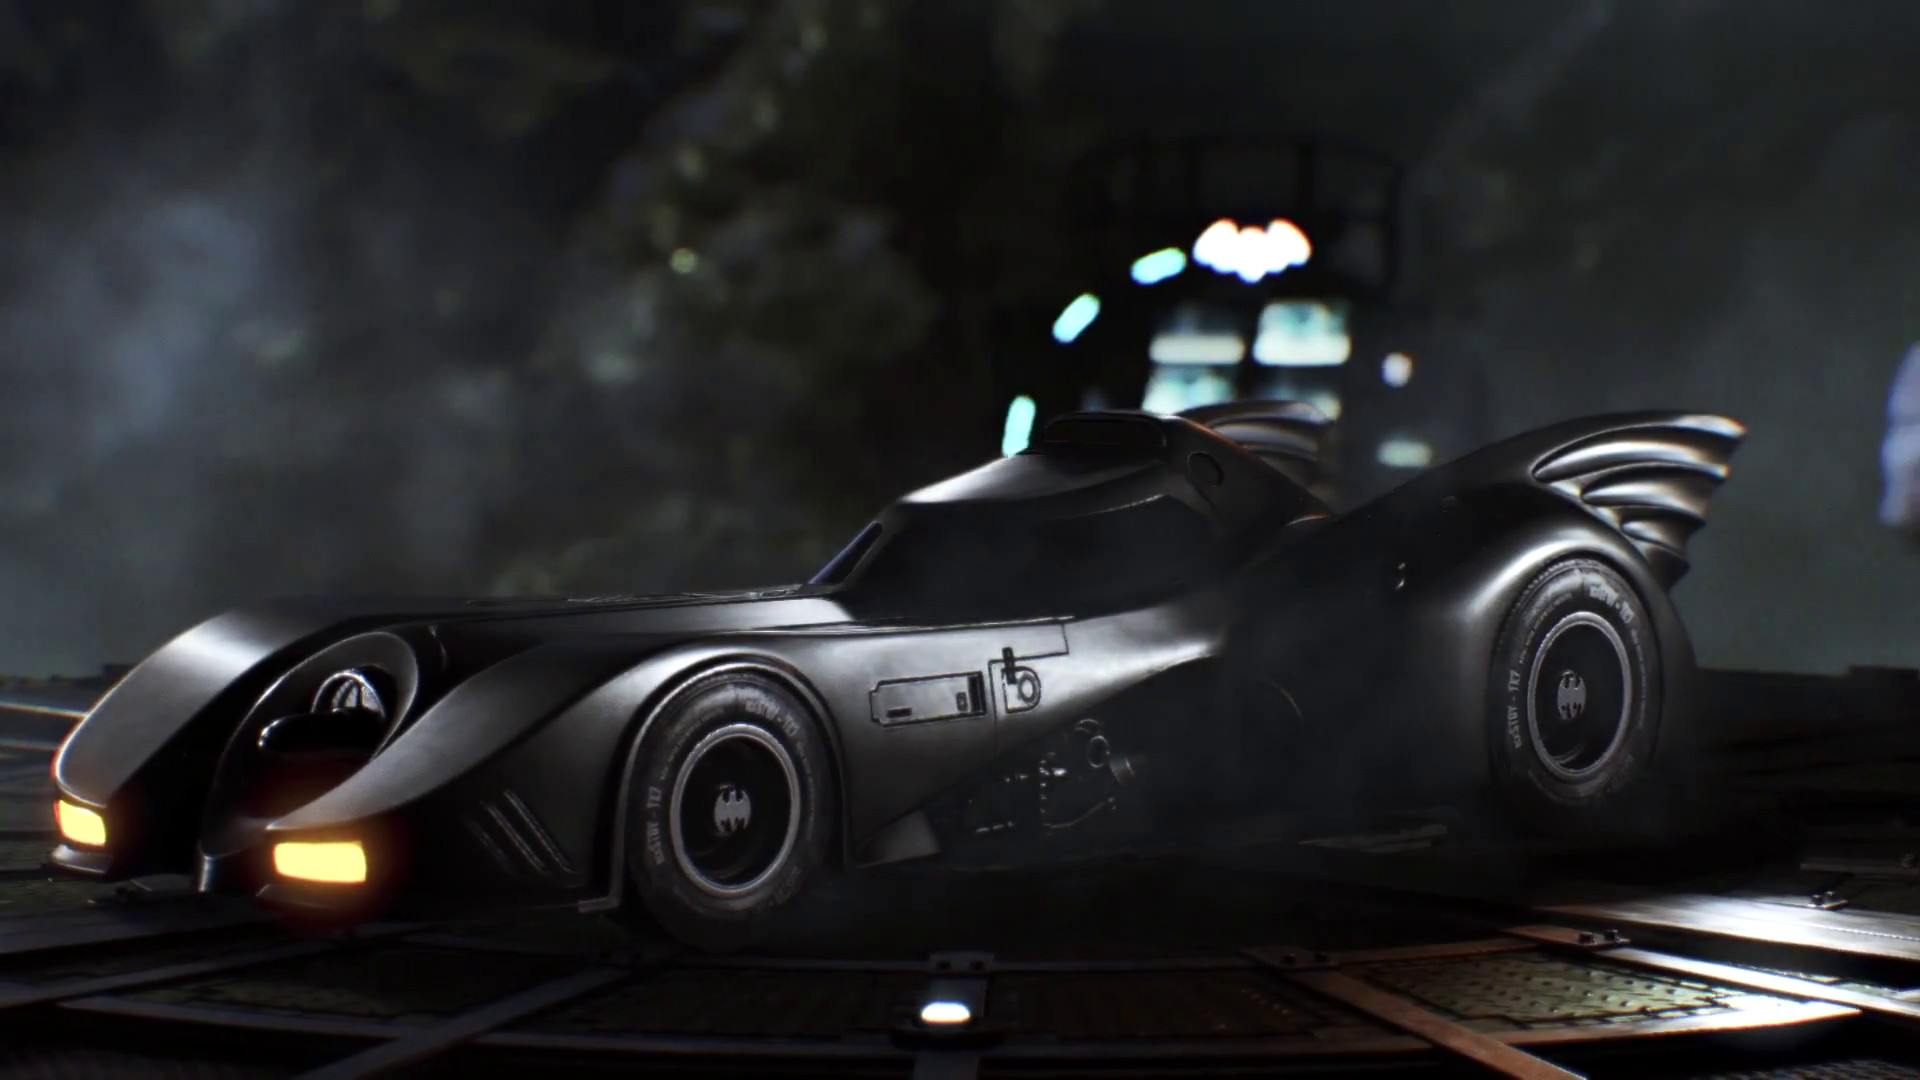 Batman Arkham Knight Gets Dark Knight S Tumbler Next Month 1989